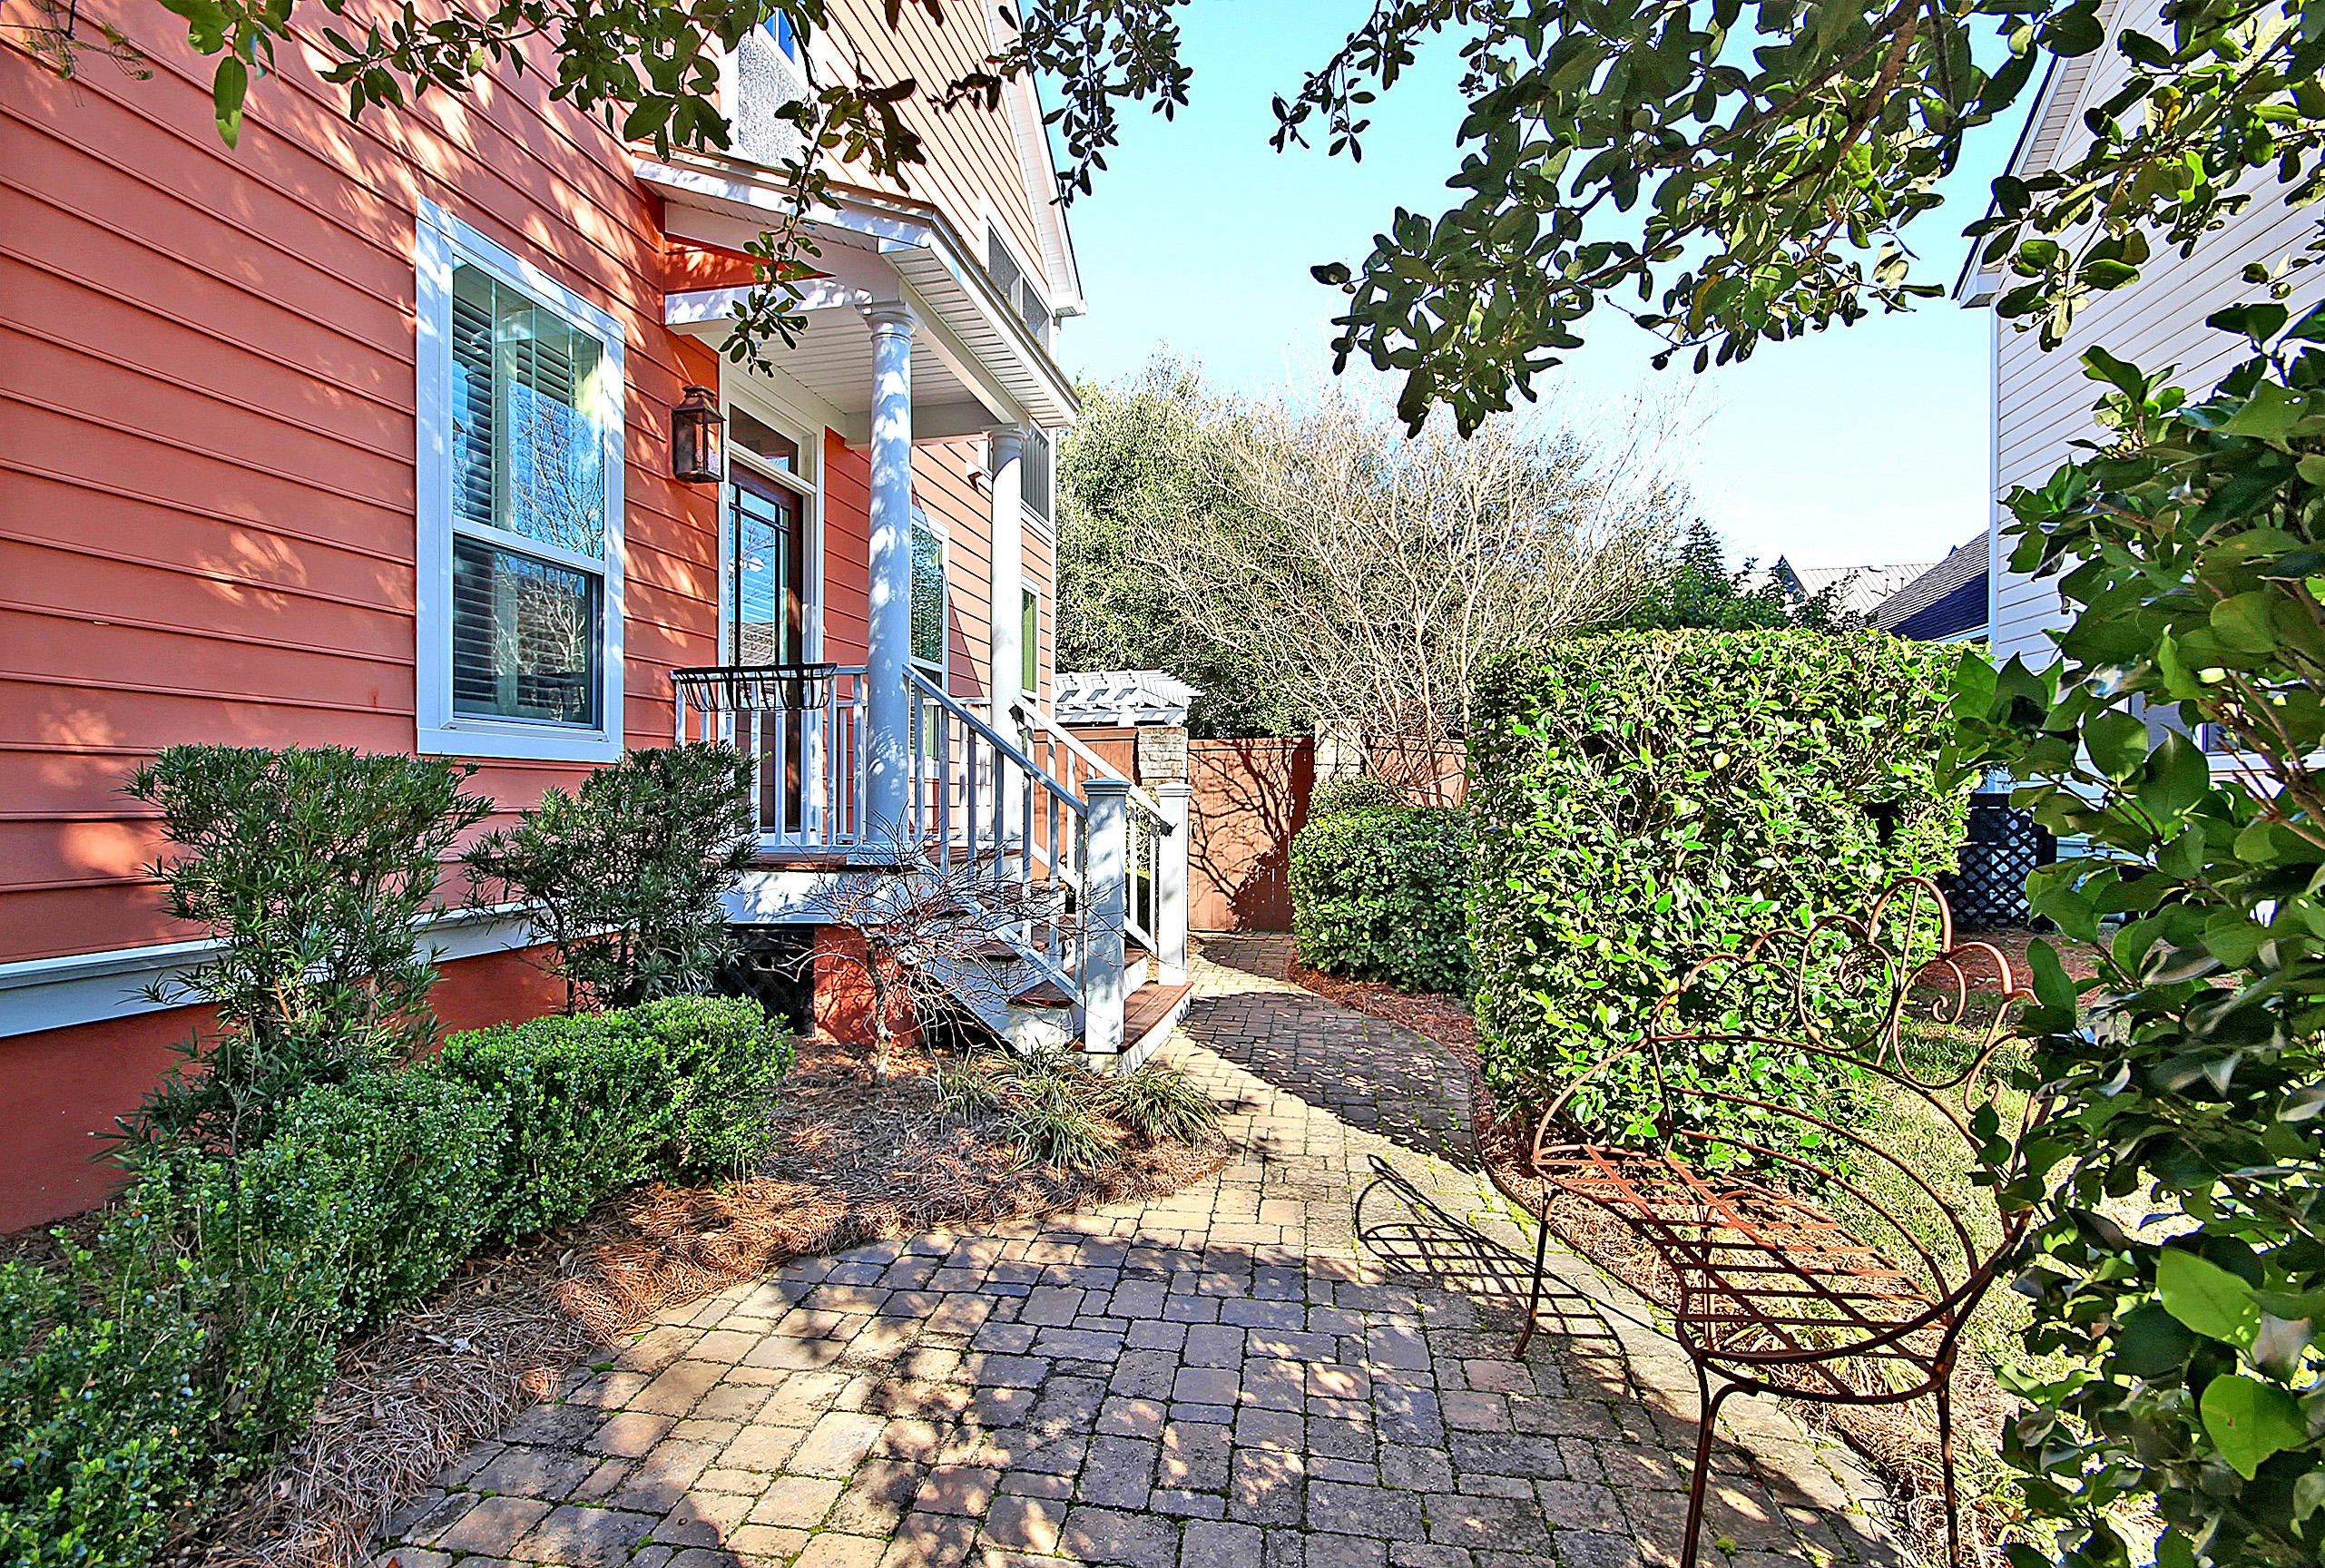 Daniel Island Homes For Sale - 950 Crossing, Daniel Island, SC - 41